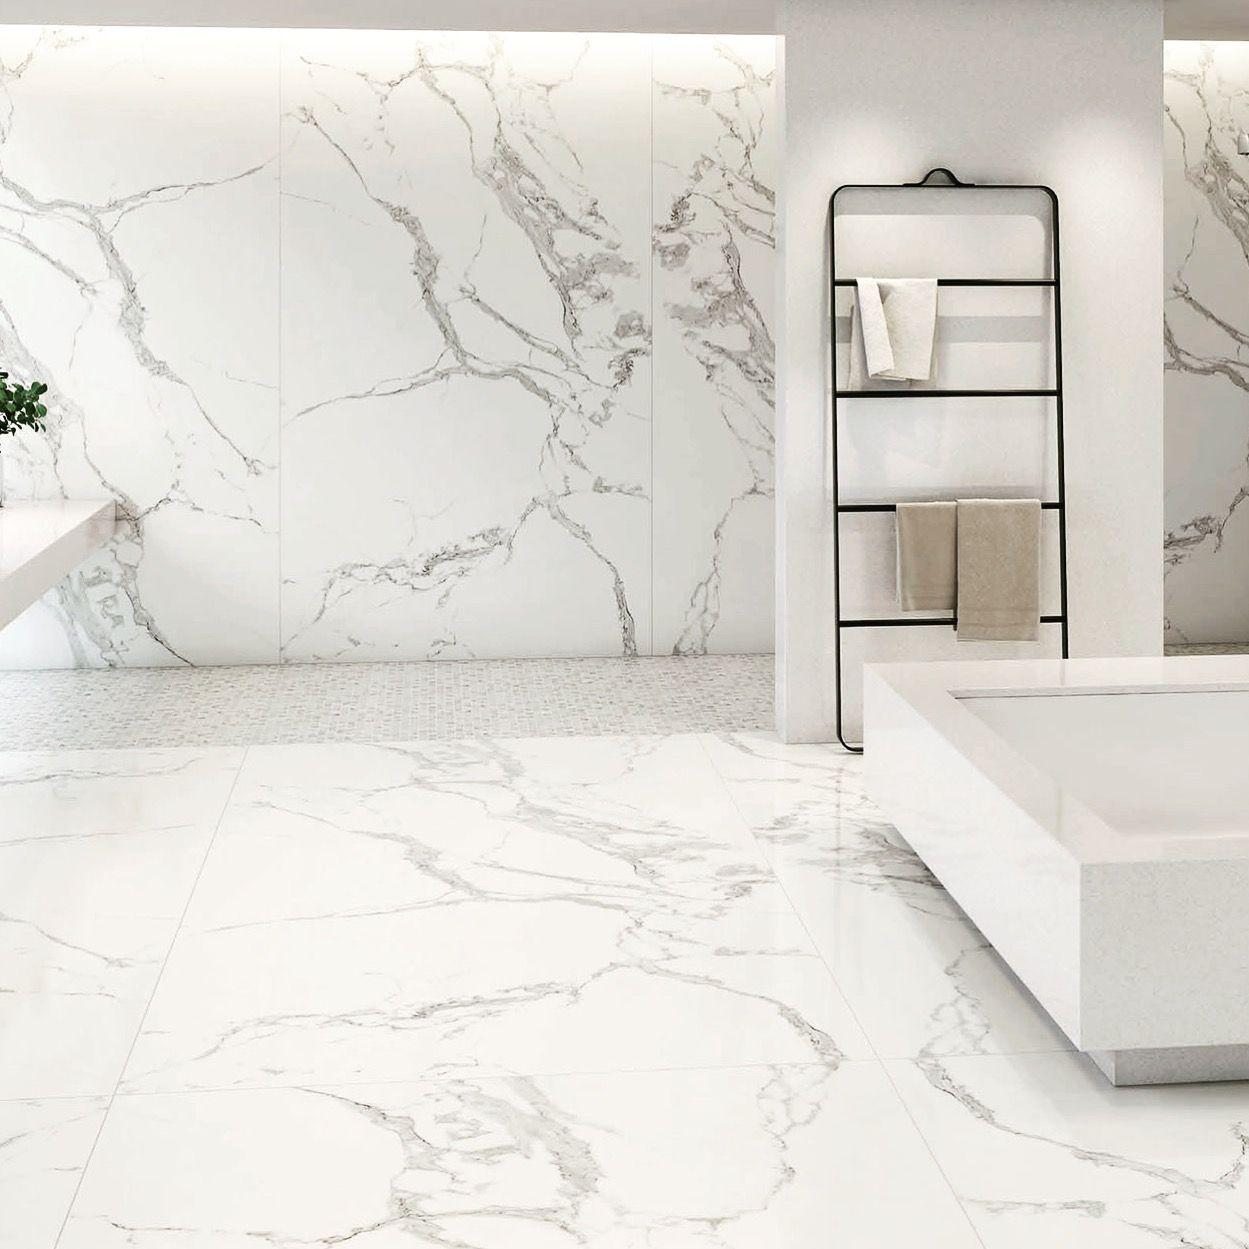 azulejo porcel nico de gran formato imitaci n m rmol On azulejos imitacion marmol